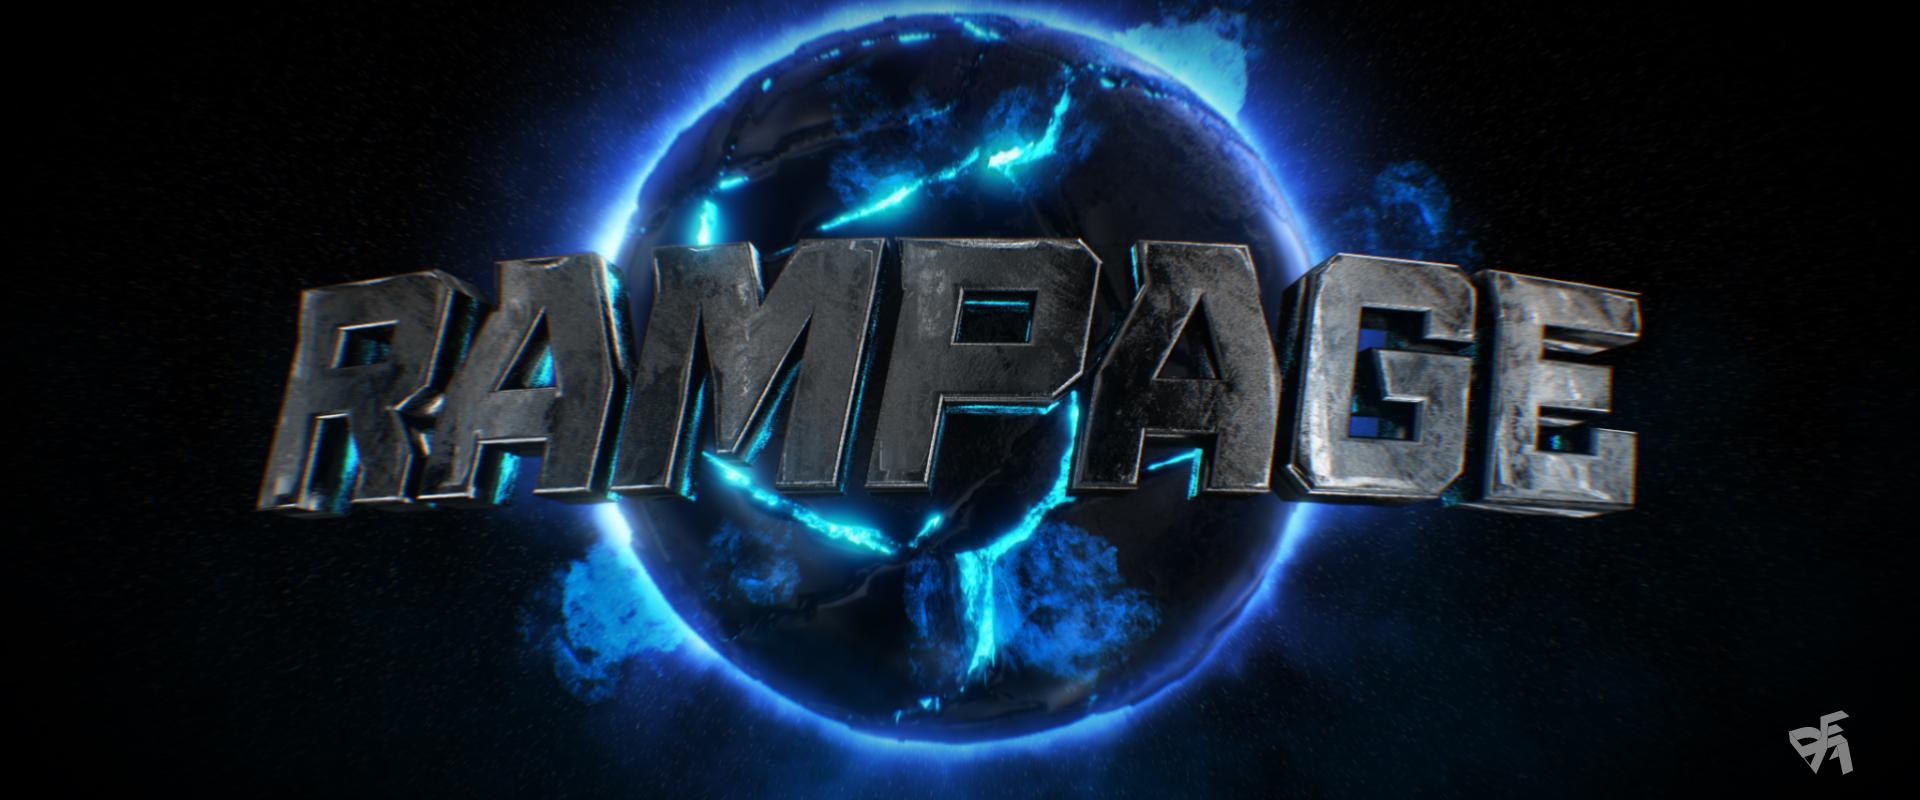 Rampage-STYLEFRAME_02.jpg